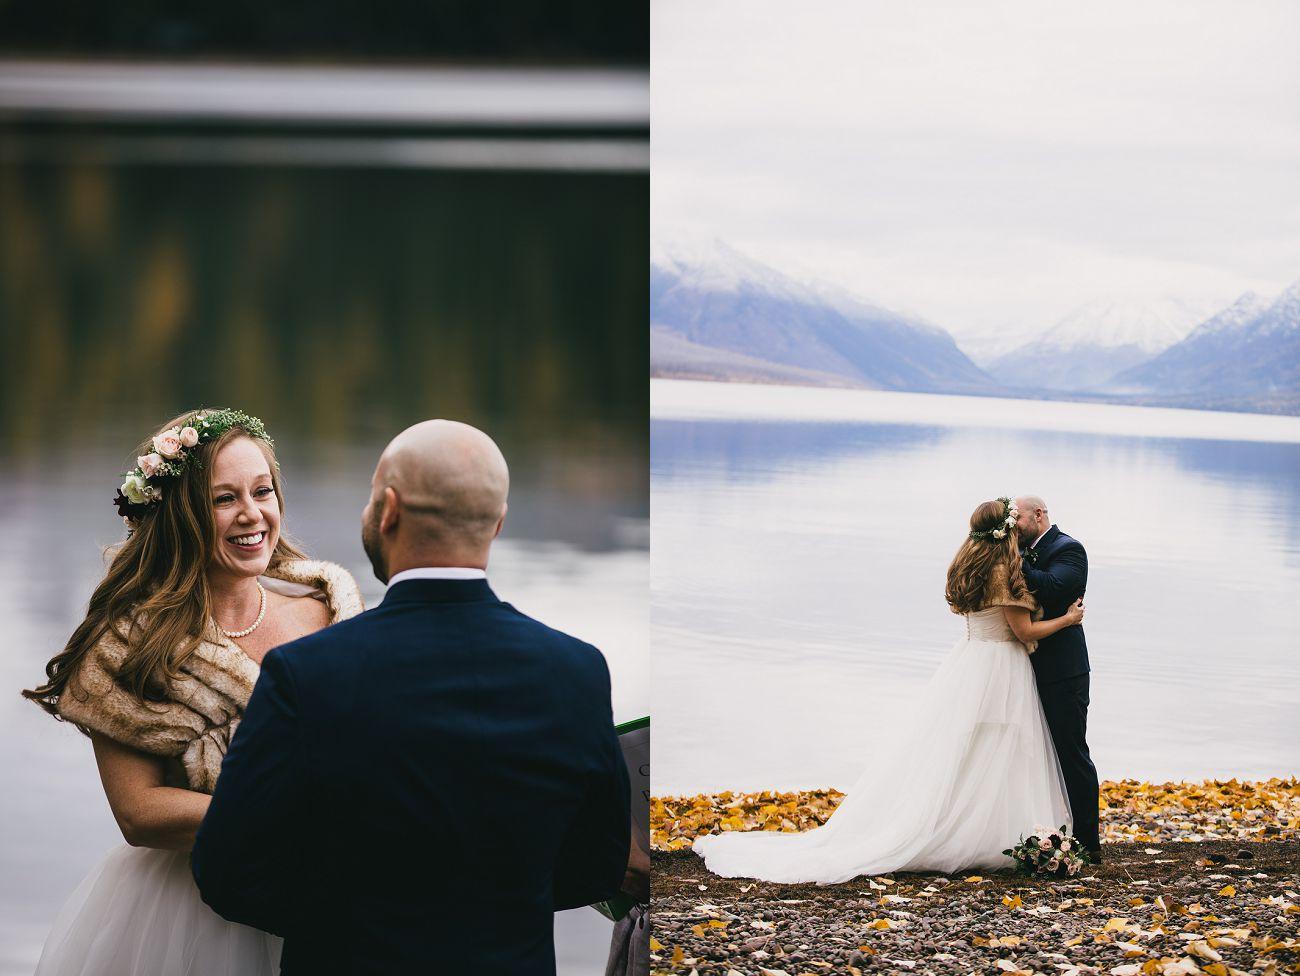 Jennifer_Mooney_Photo_Whitefish_mountain_resort_wedding_elegant_montana_wedding_037.jpg